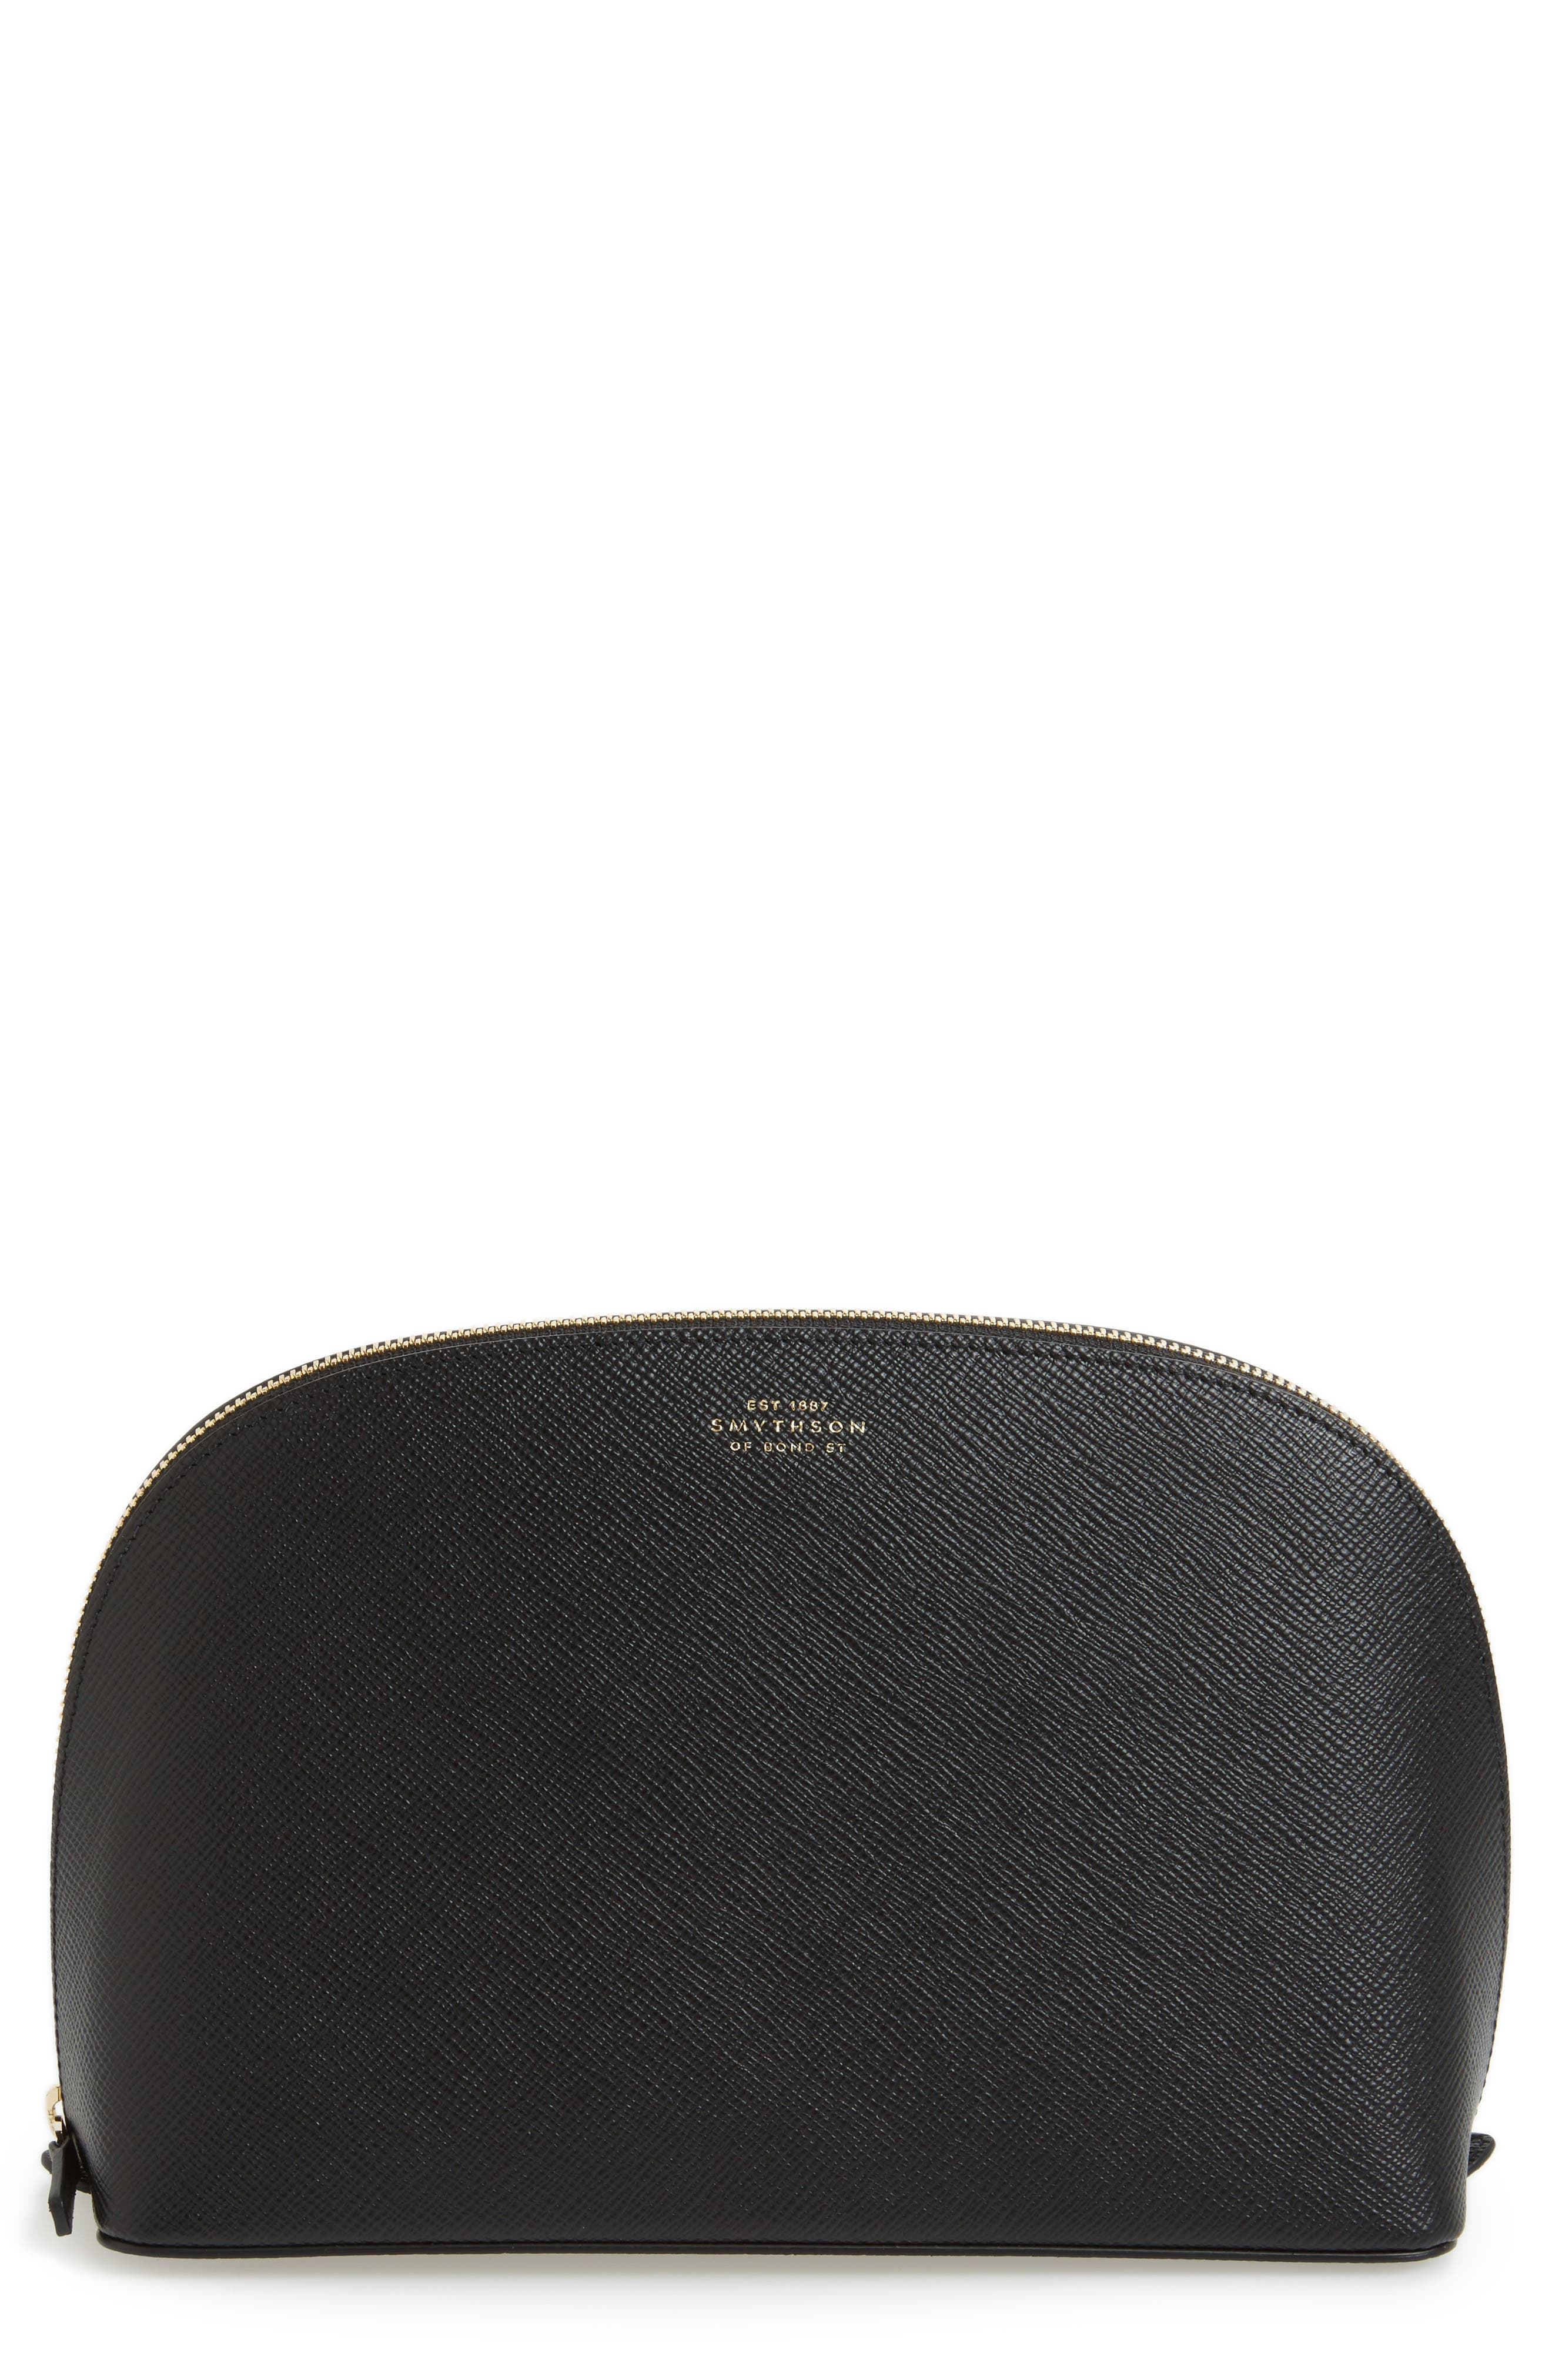 Medium Leather Cosmetics Bag,                         Main,                         color, Black